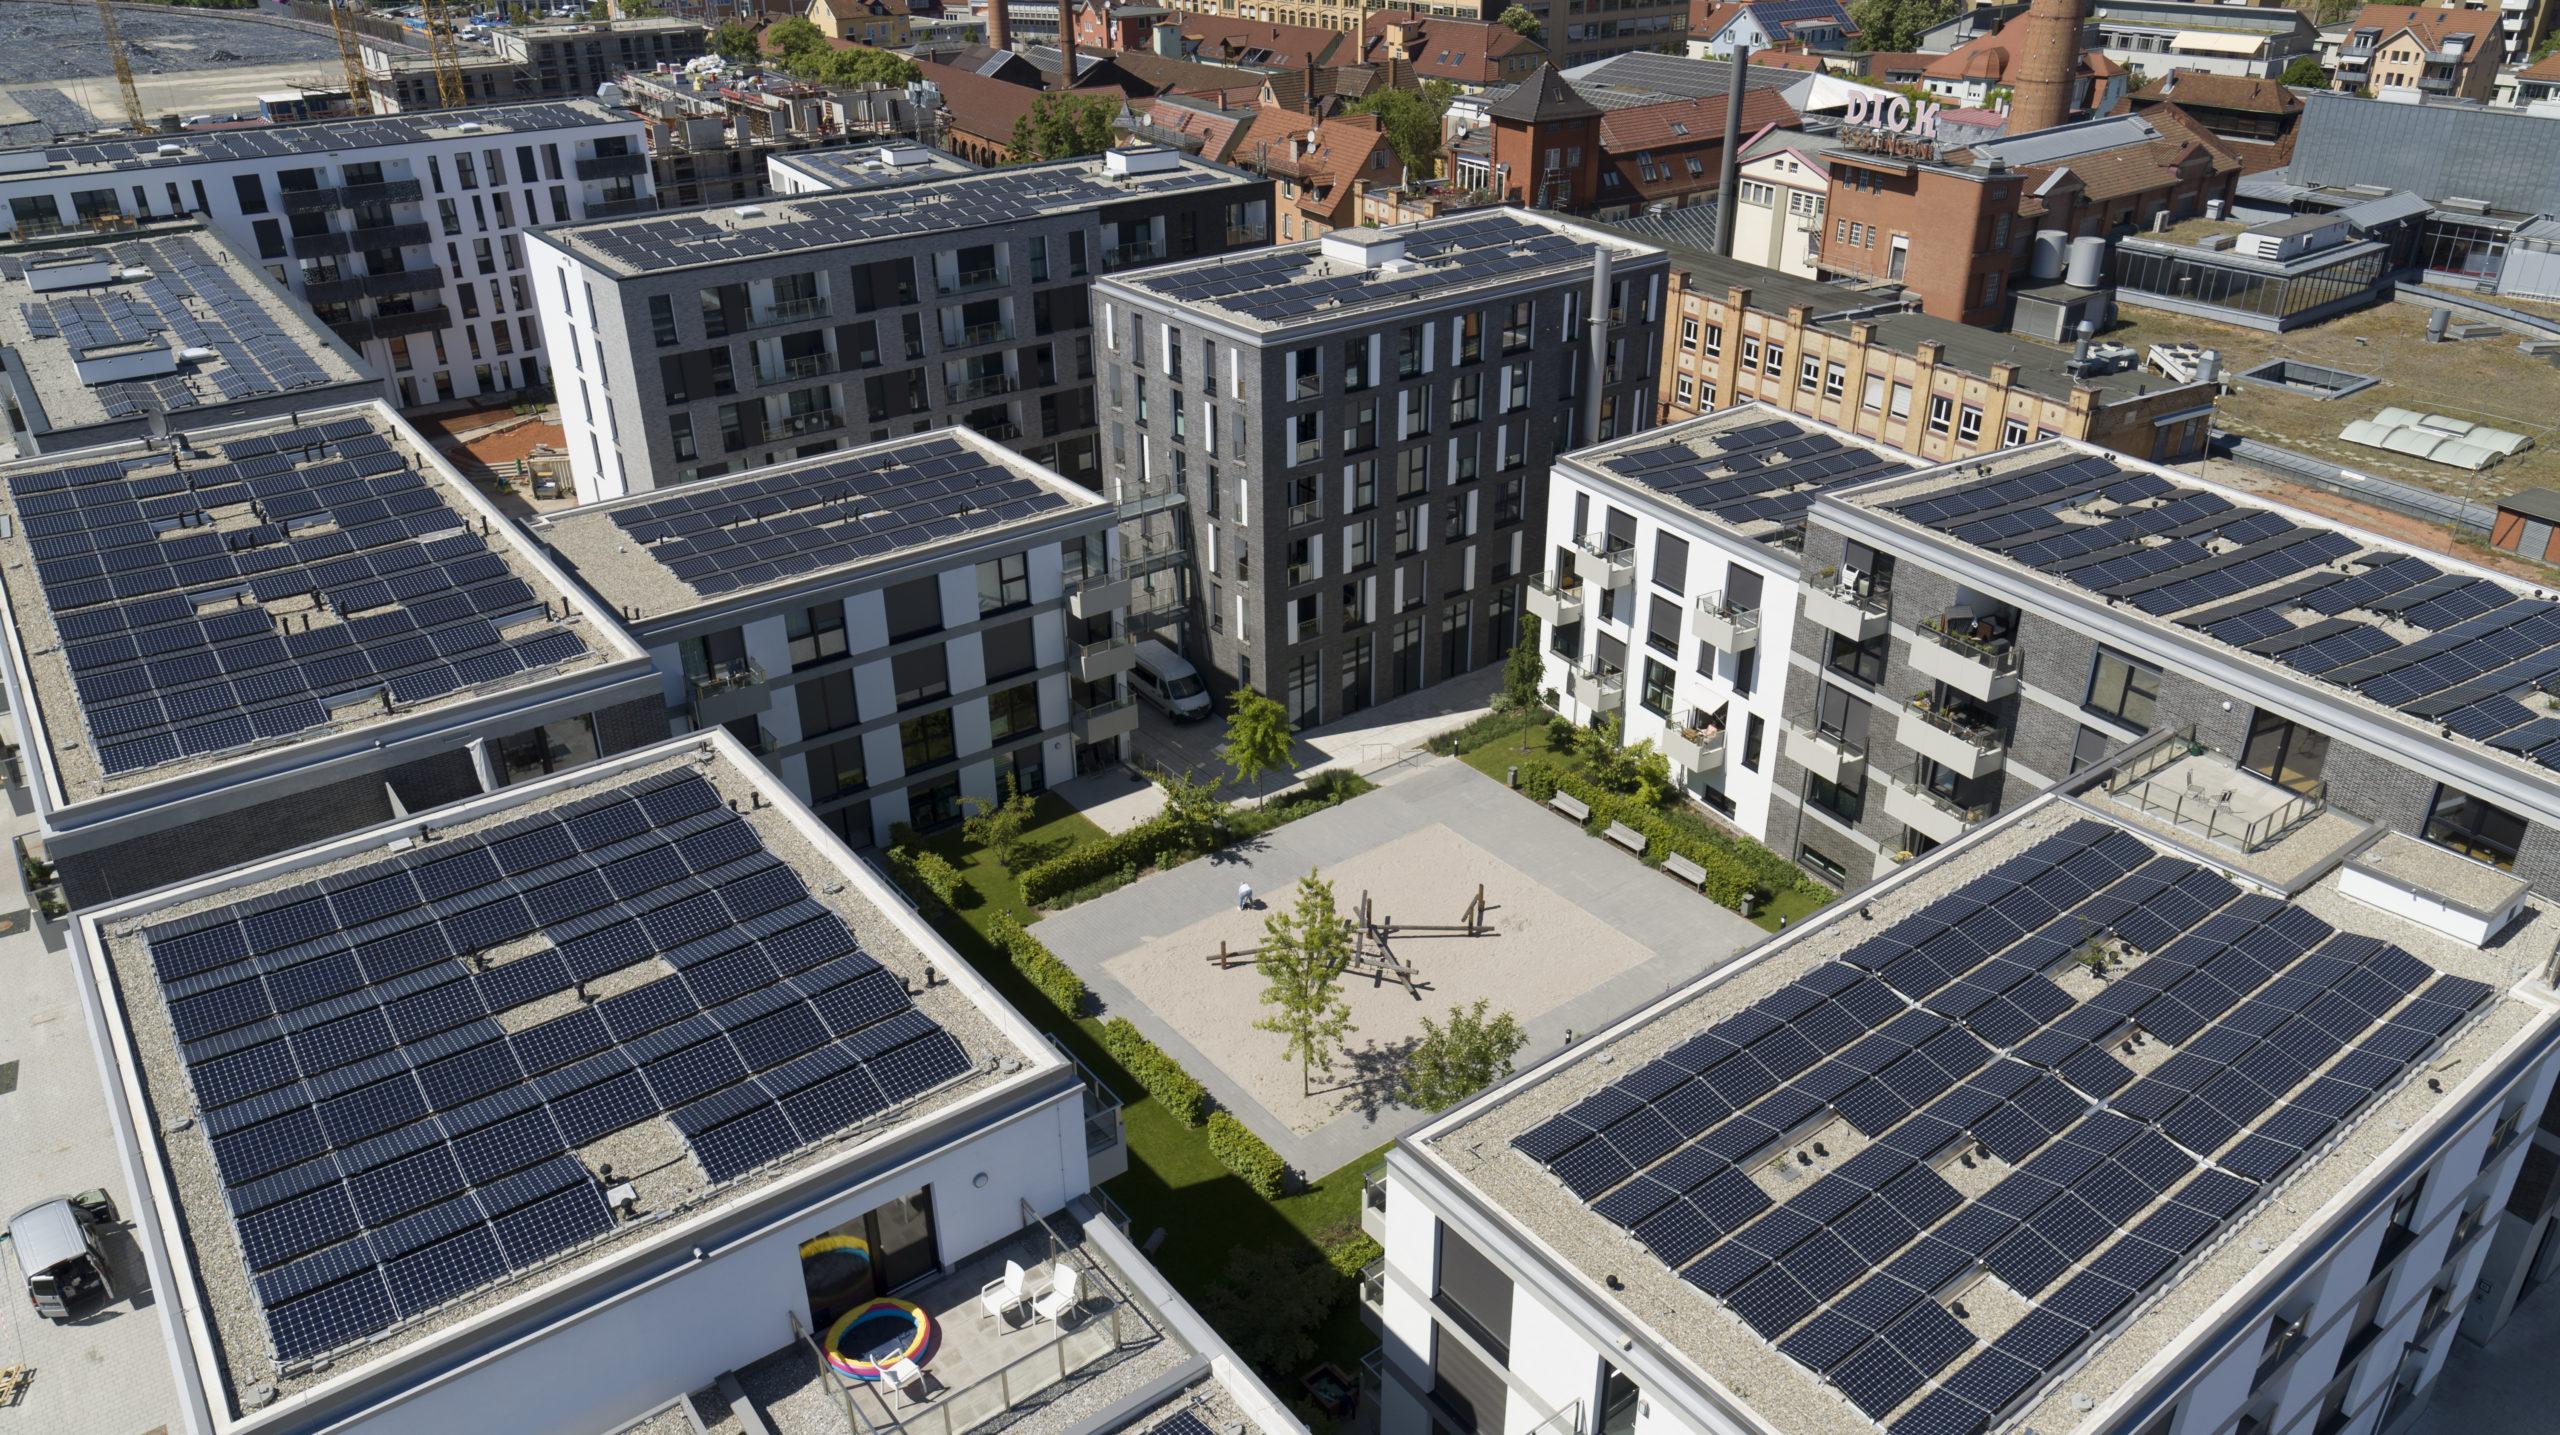 Solarisierung des Block B des Klimaquartiers, Bildquelle: Blumberg GmbH / Maximilian Kamps, Stuttgart